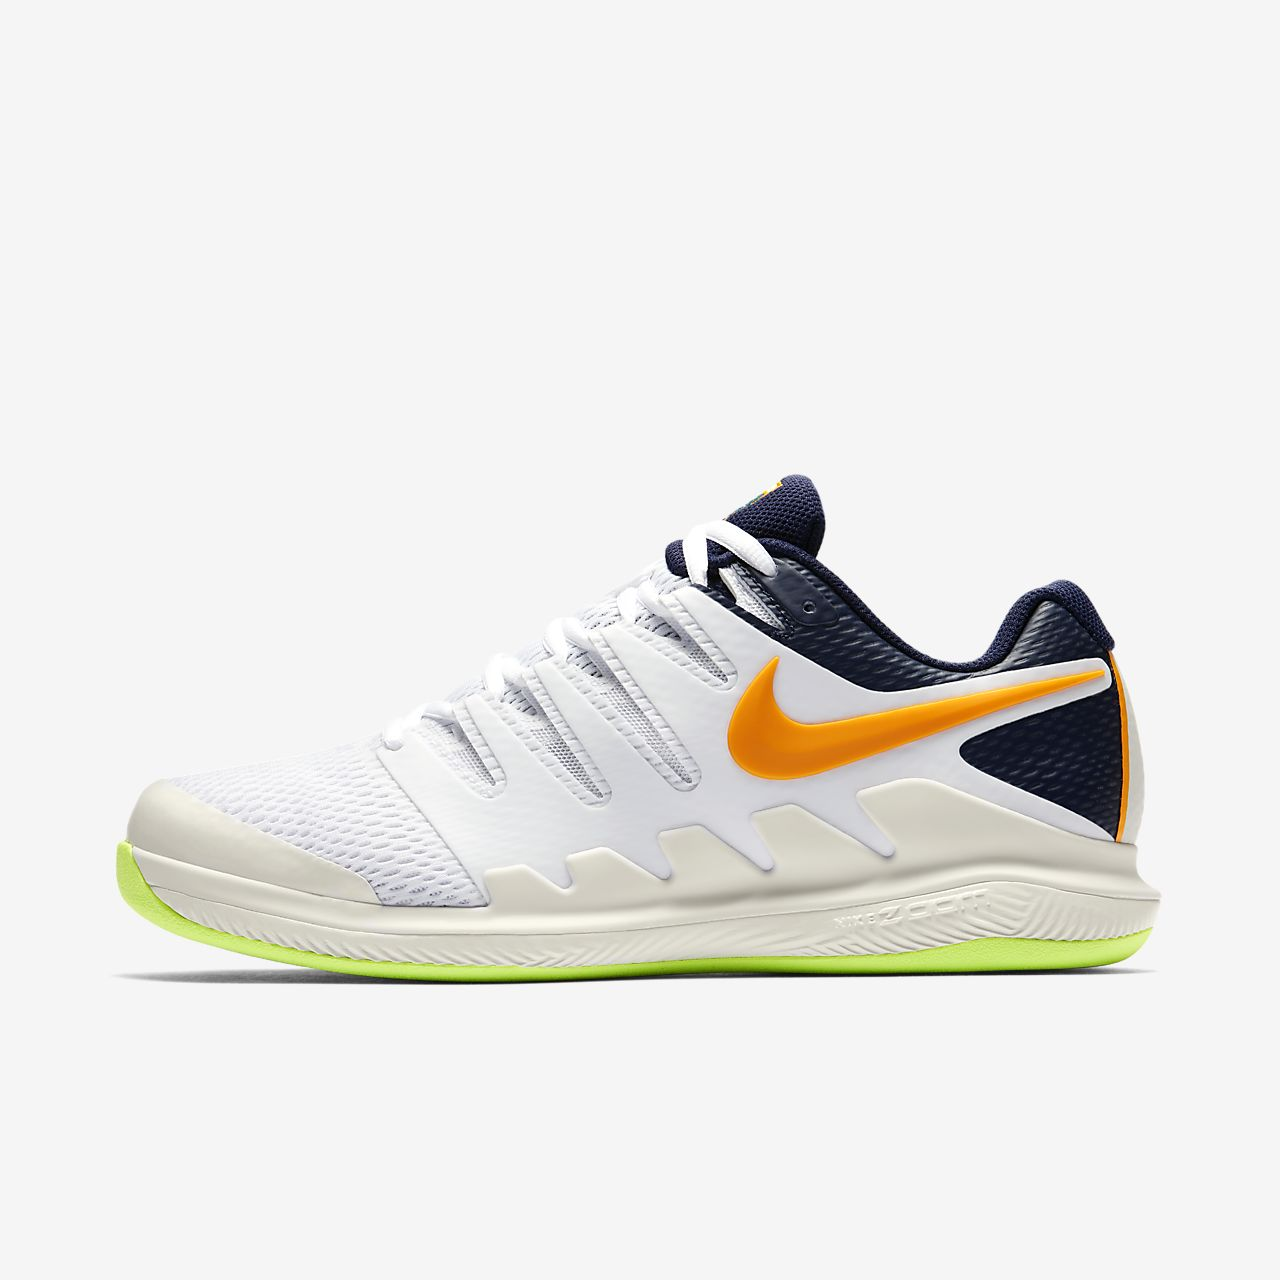 new style db216 f6622 ... Nike Air Zoom Vapor X Carpet Men s Tennis Shoe